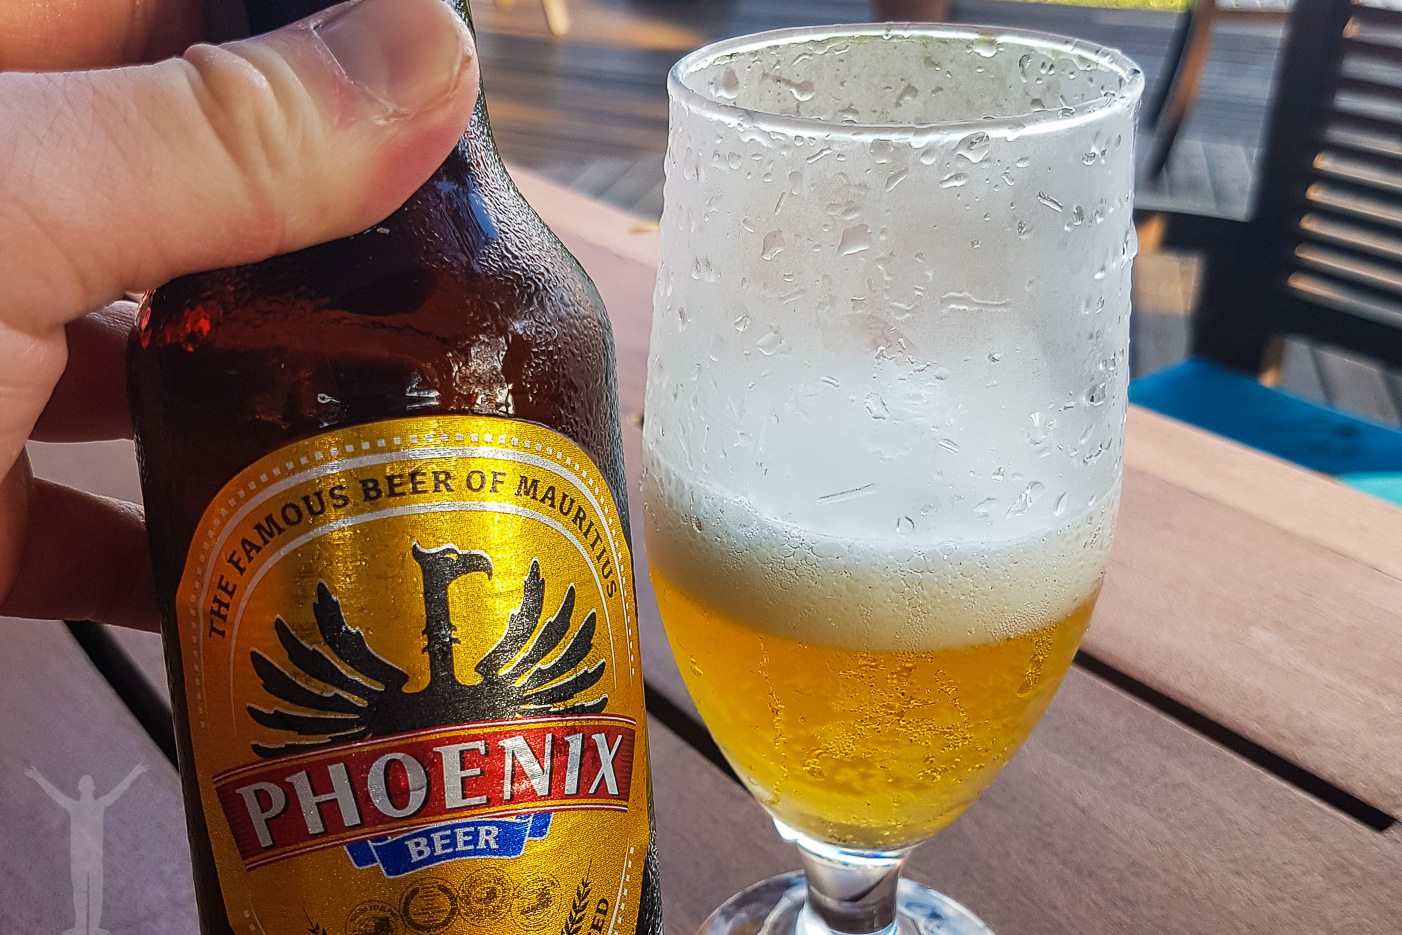 En öl vid golfbanan.